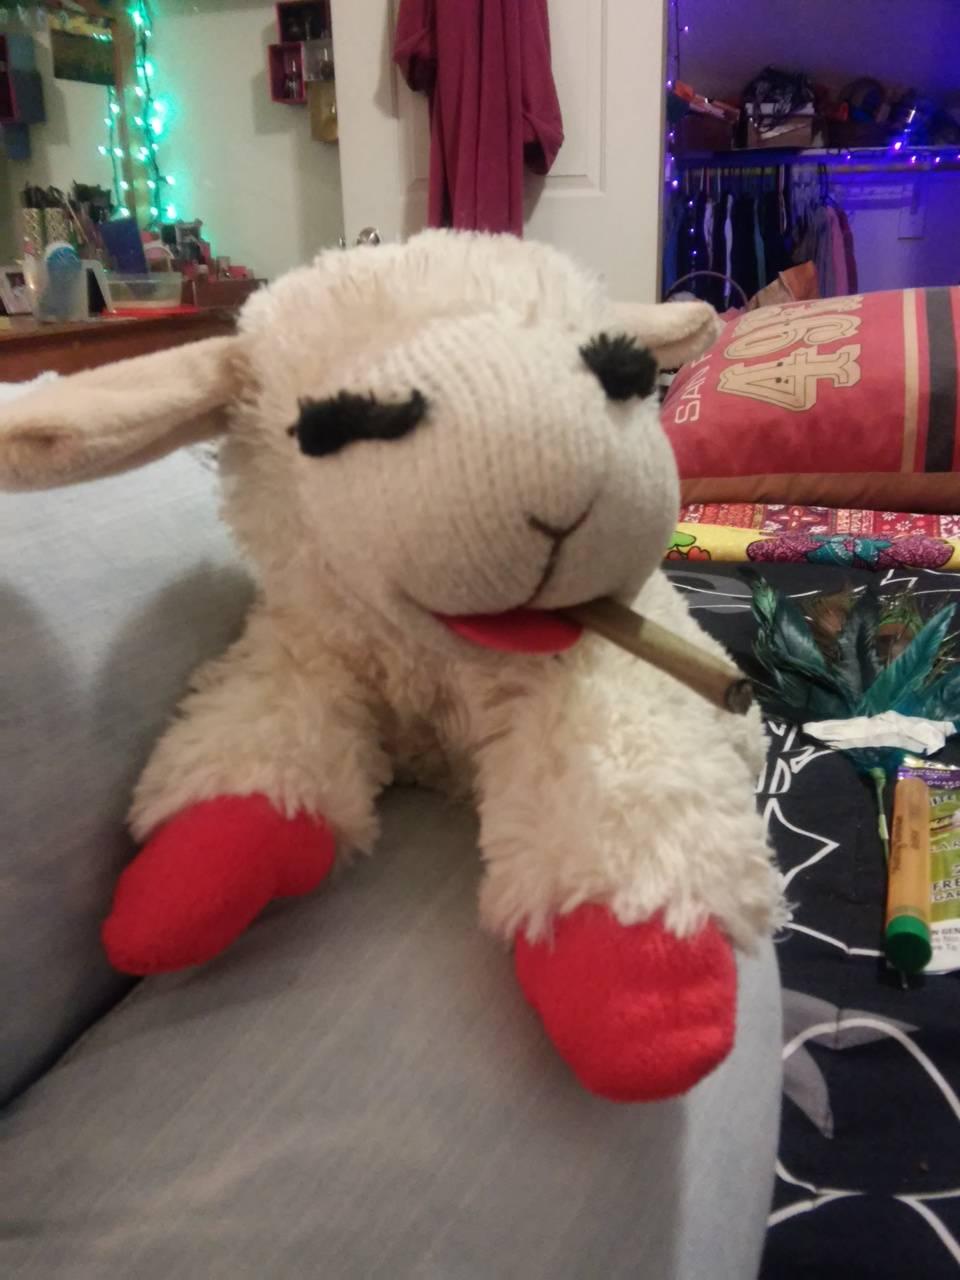 Lambchop blunts up